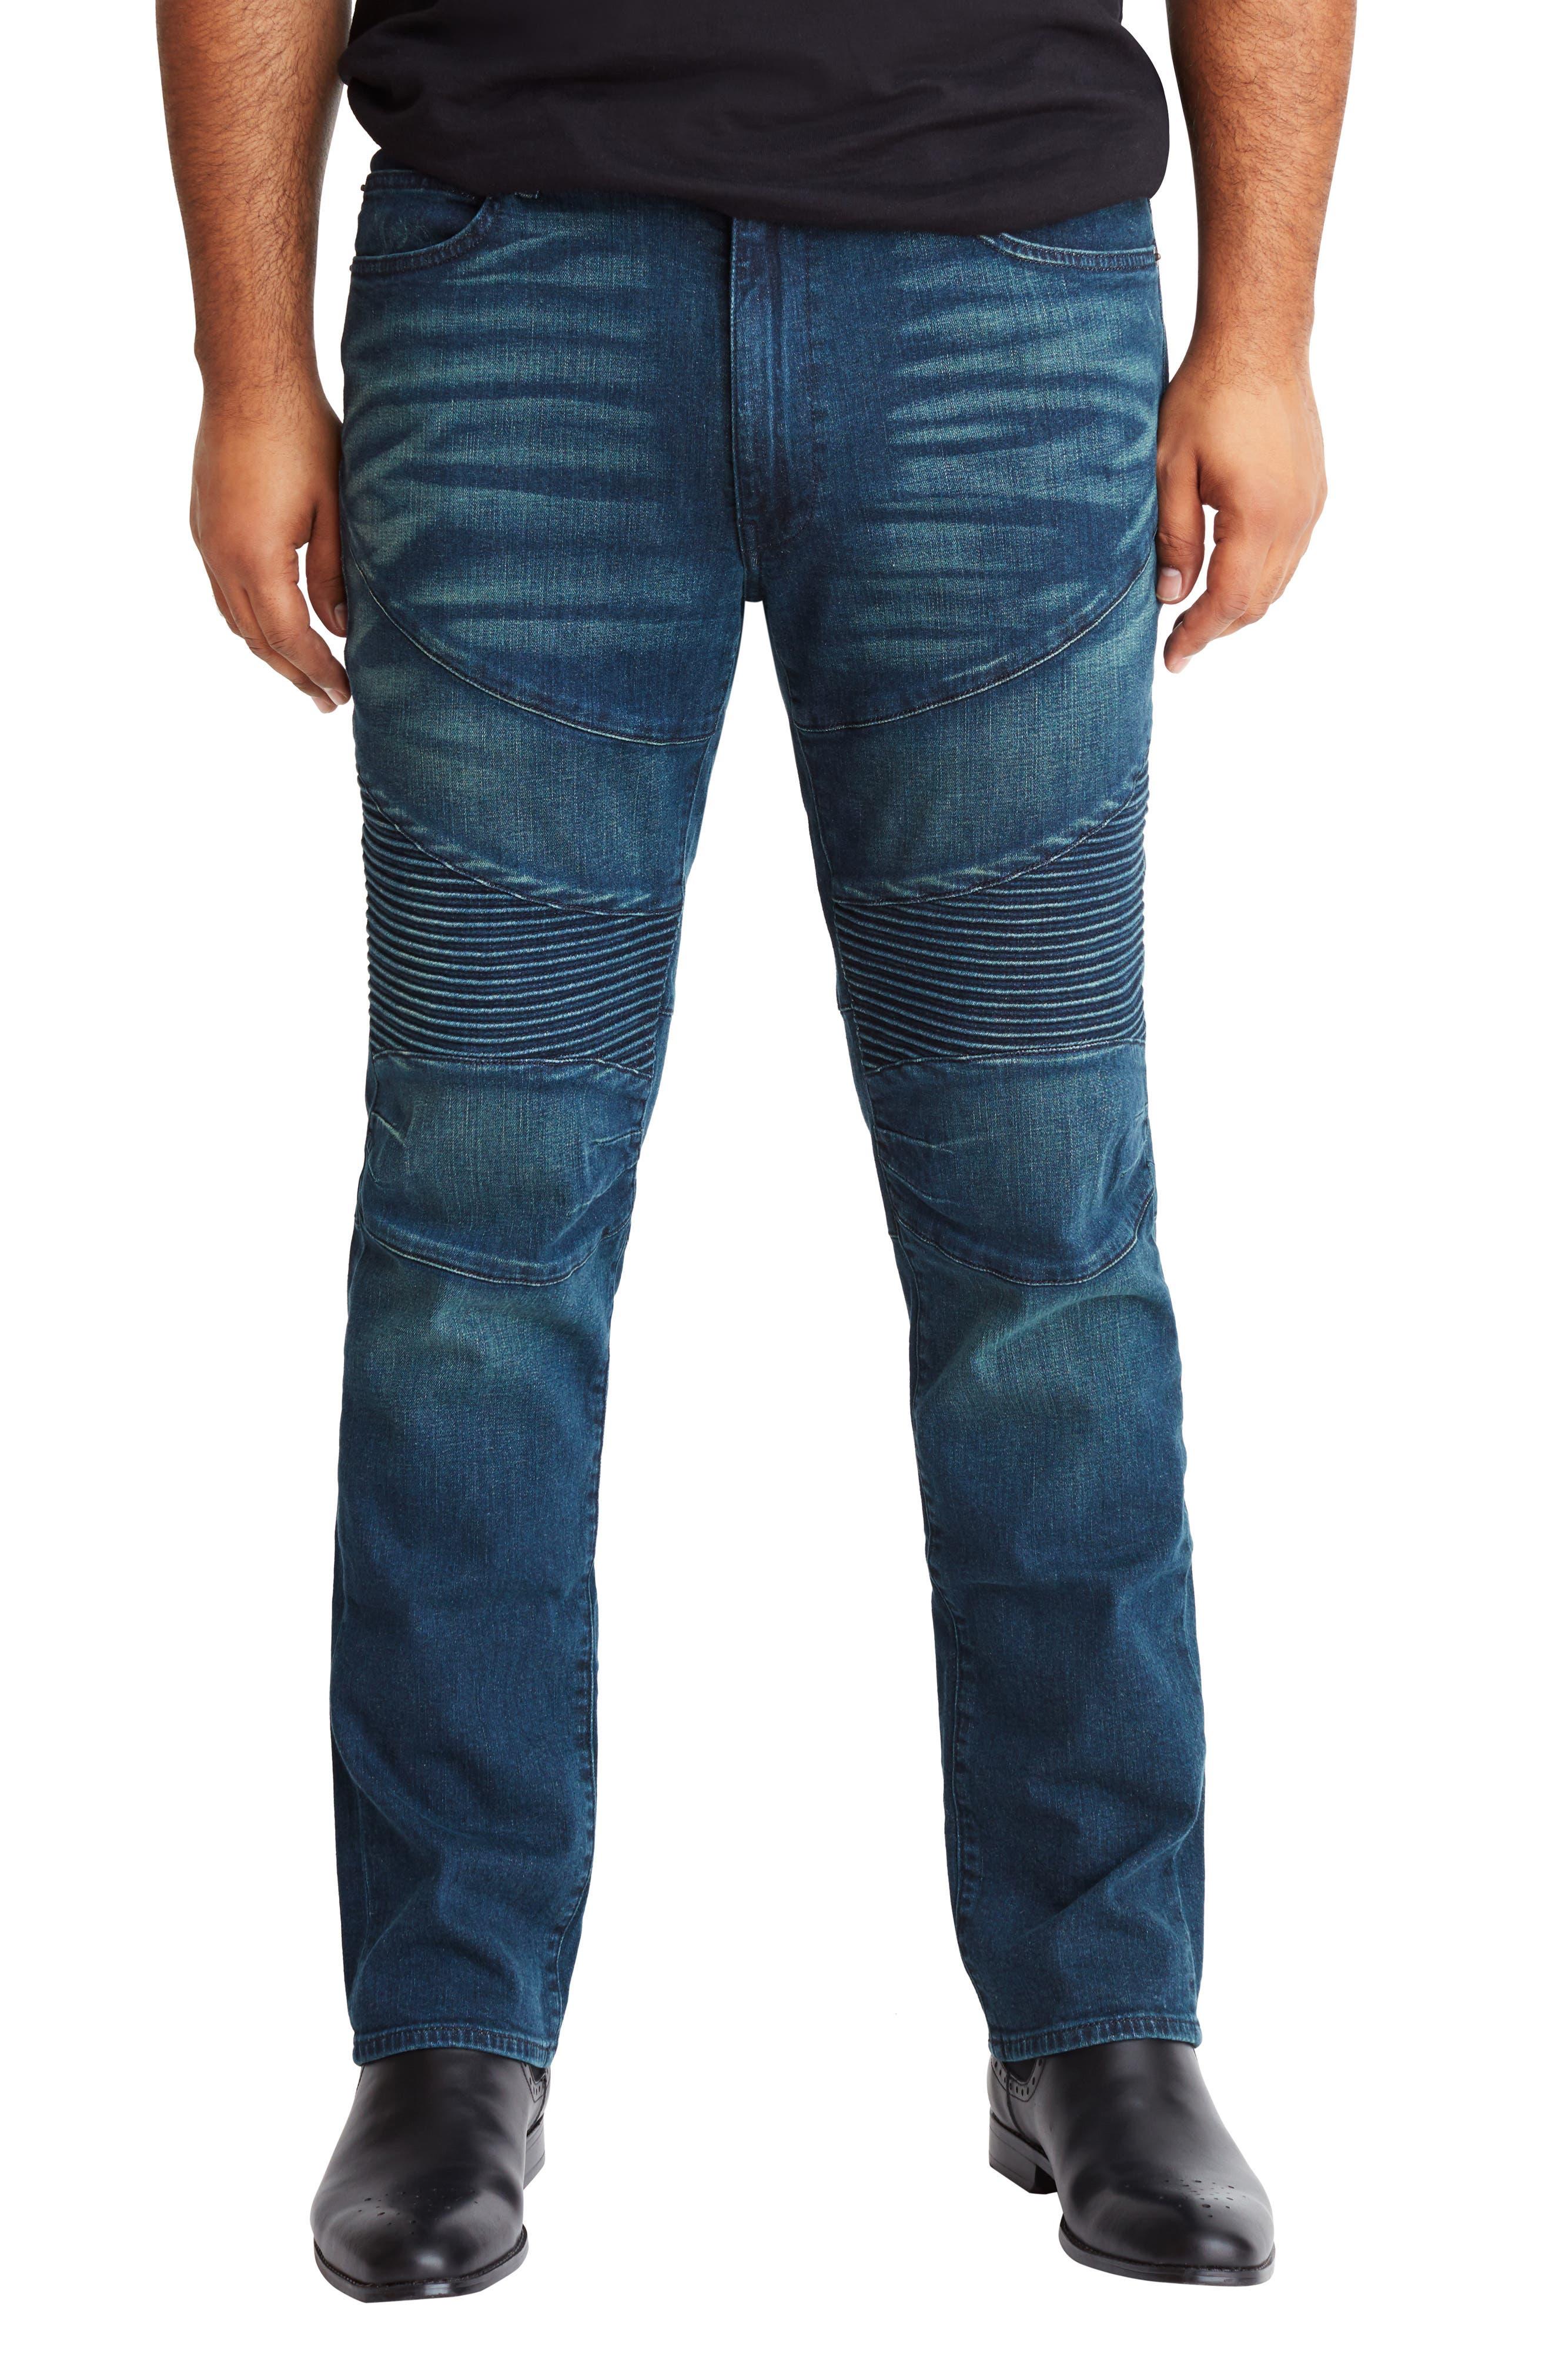 Straight Leg Biker Jeans